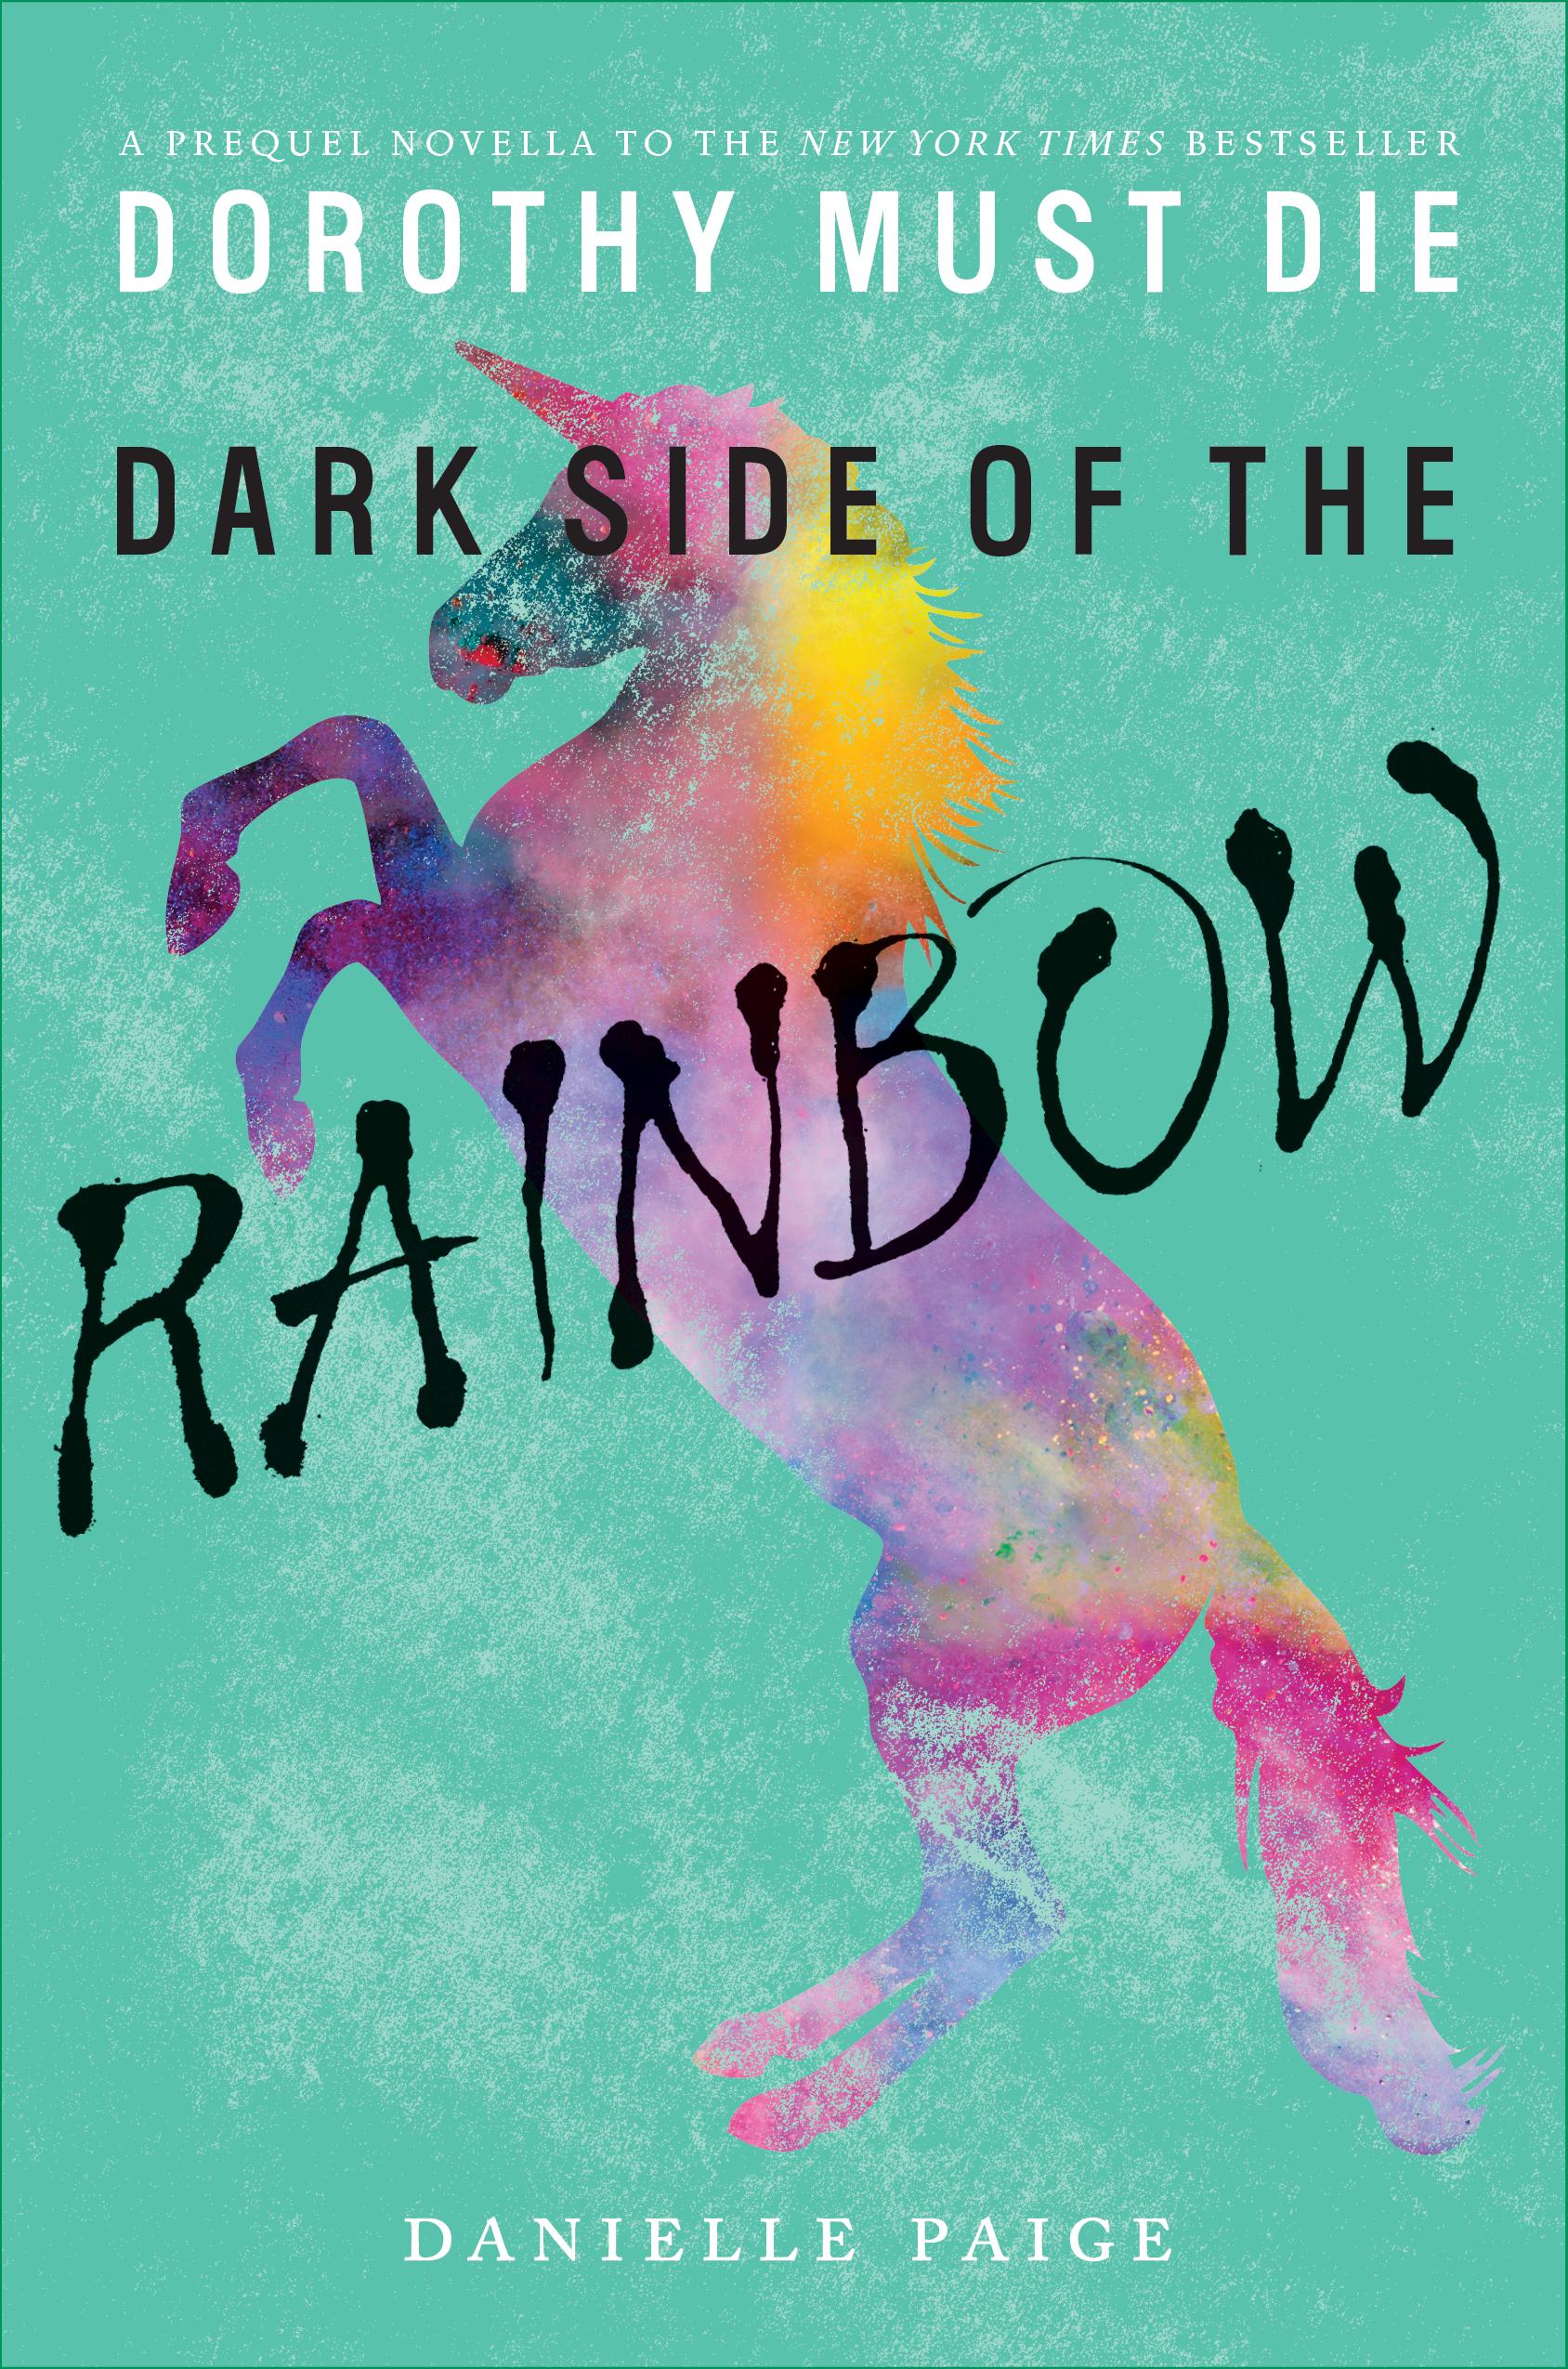 Dark Side of the Rainbow 2chosen.jpg